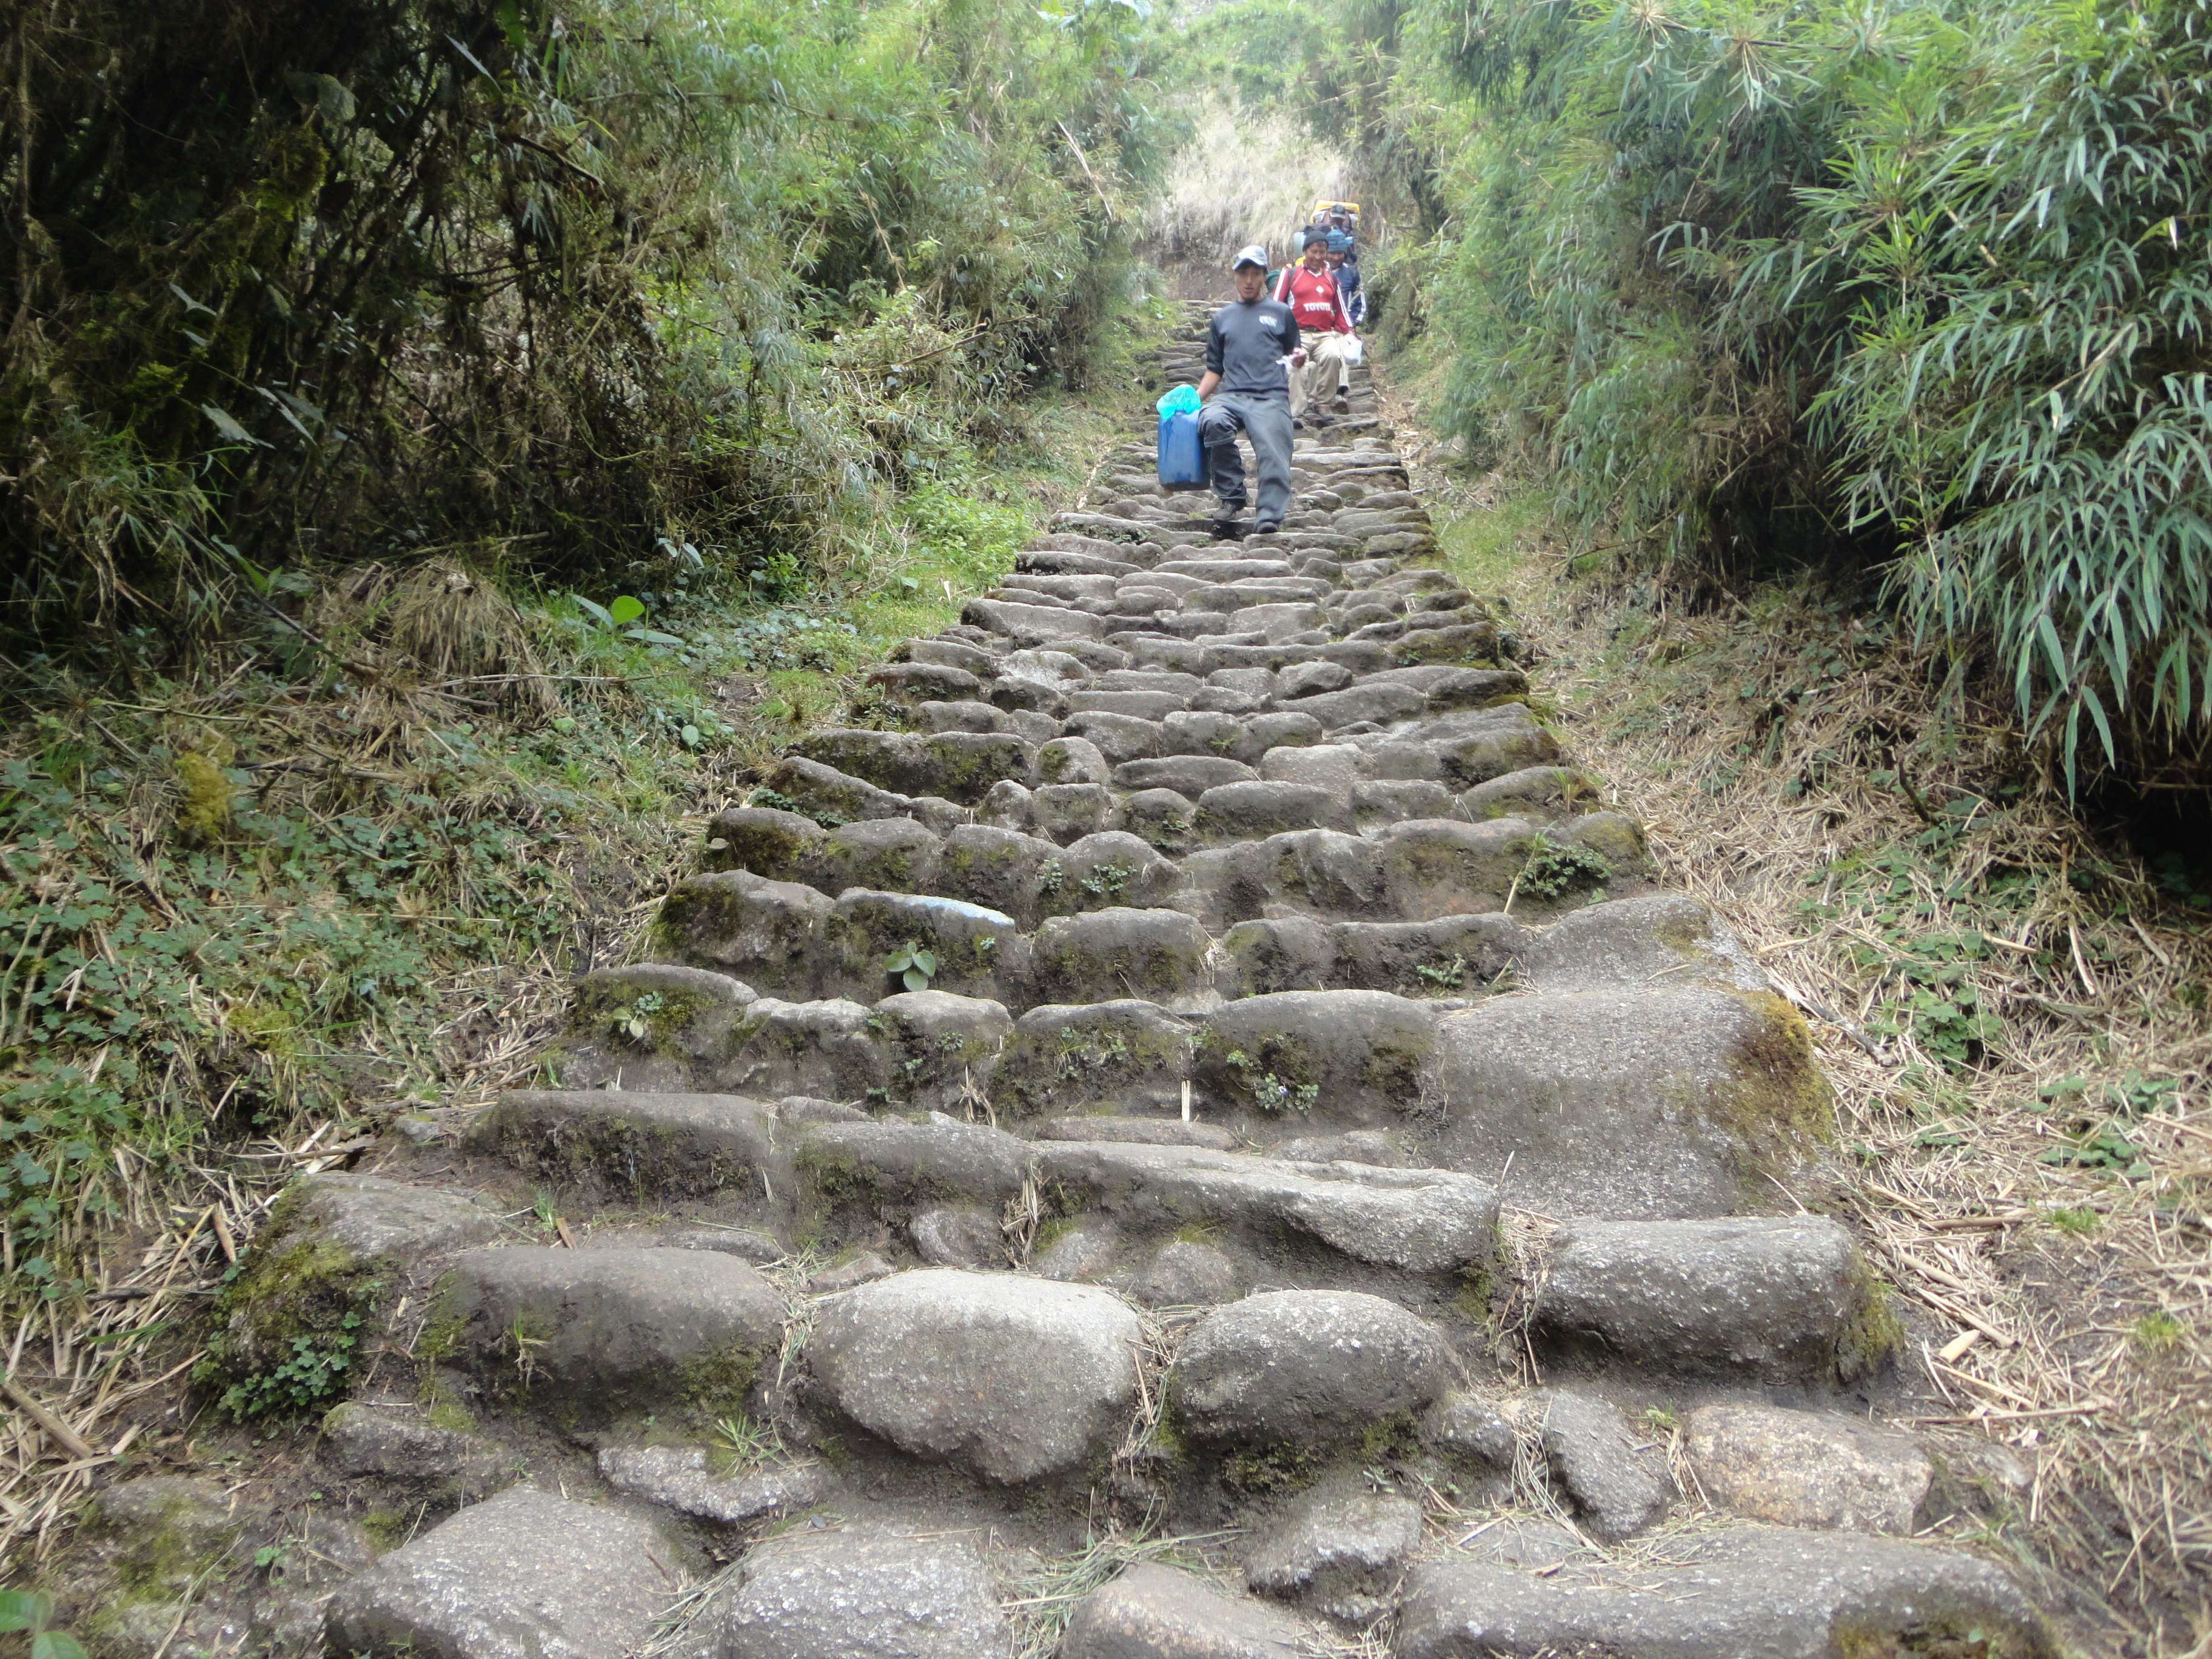 The Inca Trail 4 Day Trek